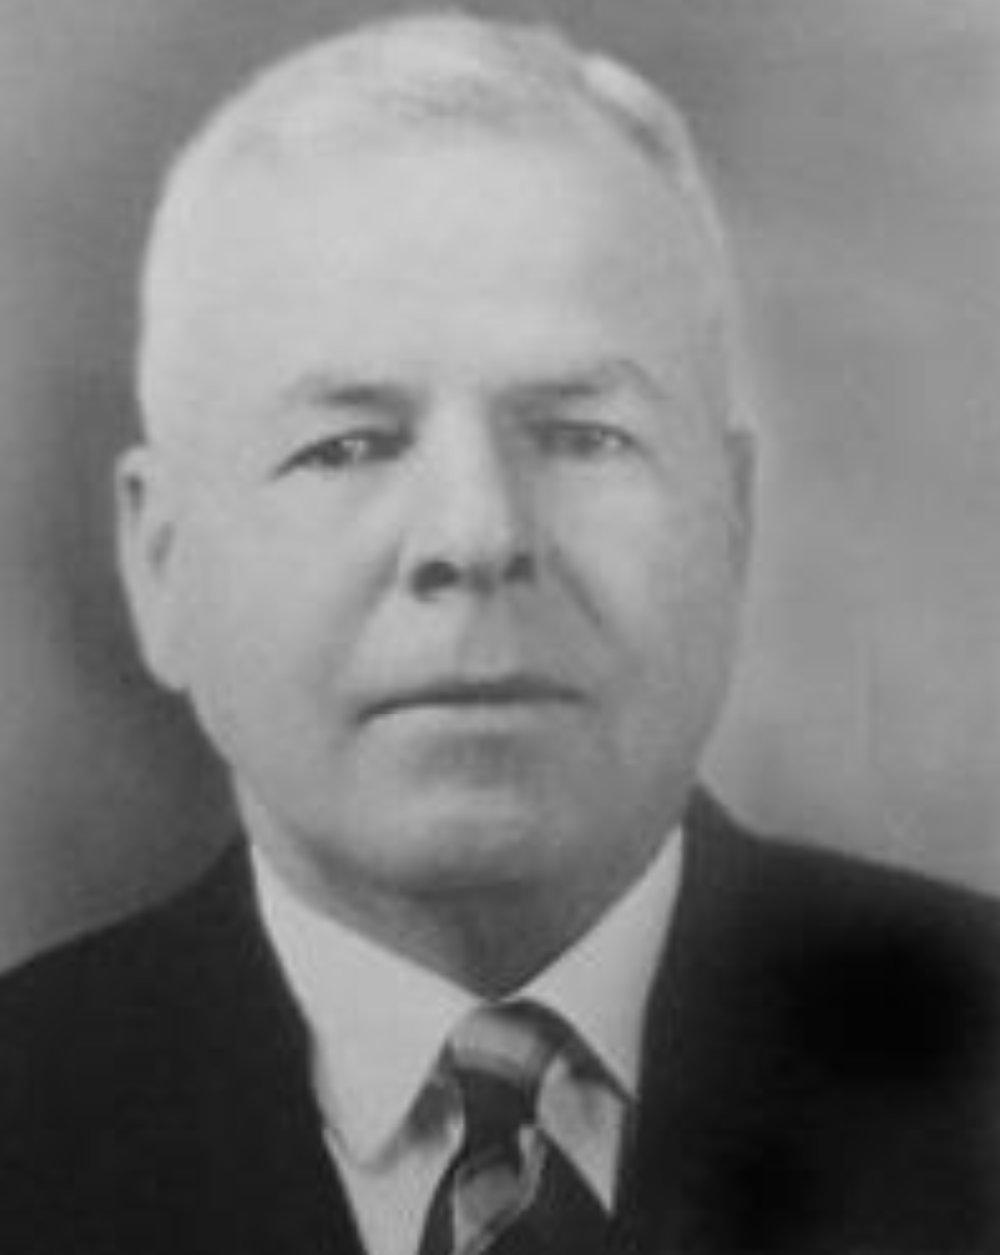 JOHN W. MCCLURE